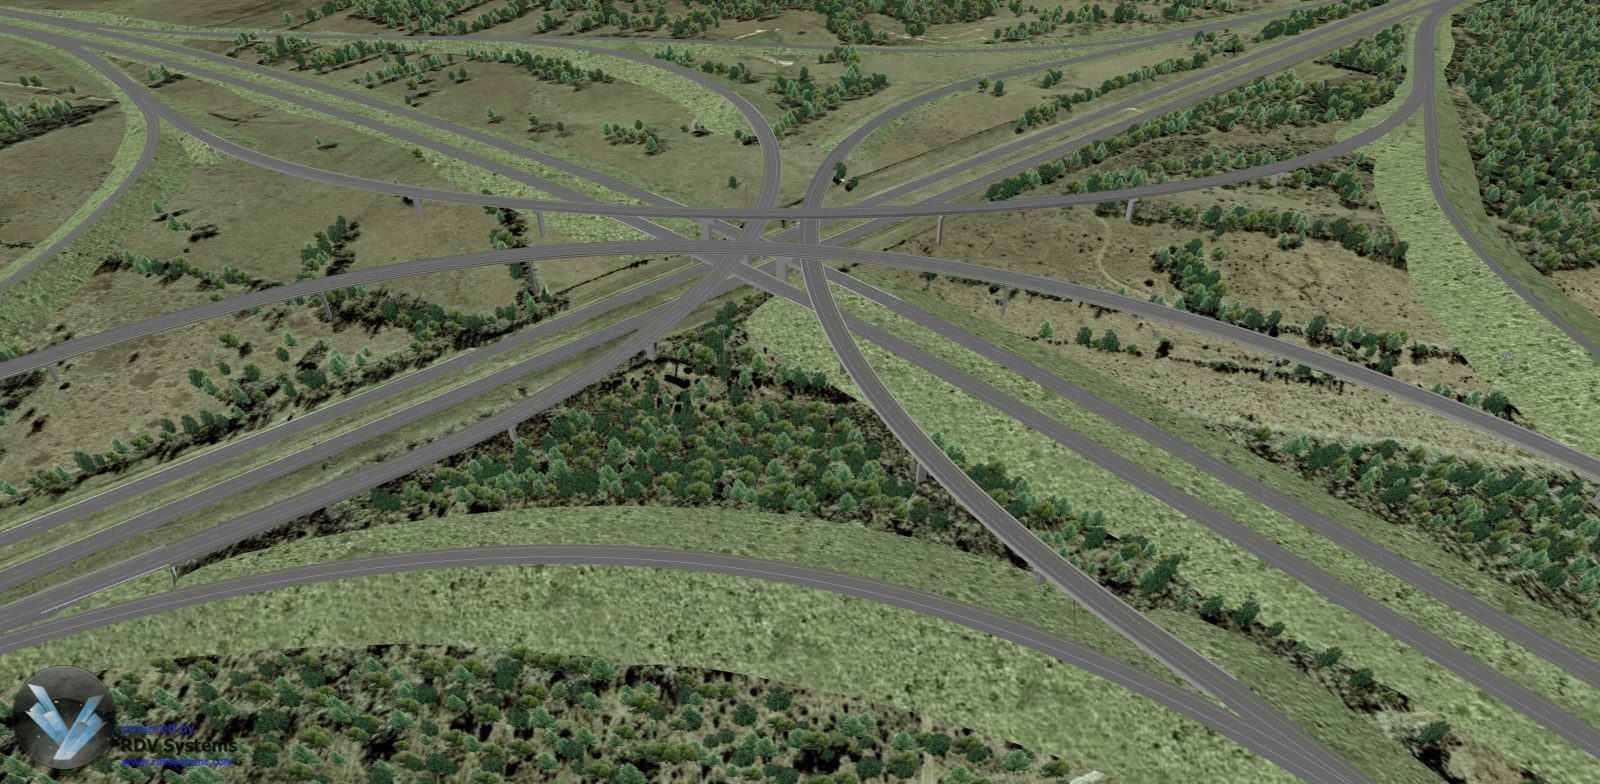 RDV Systems - I-65 Interchange 4